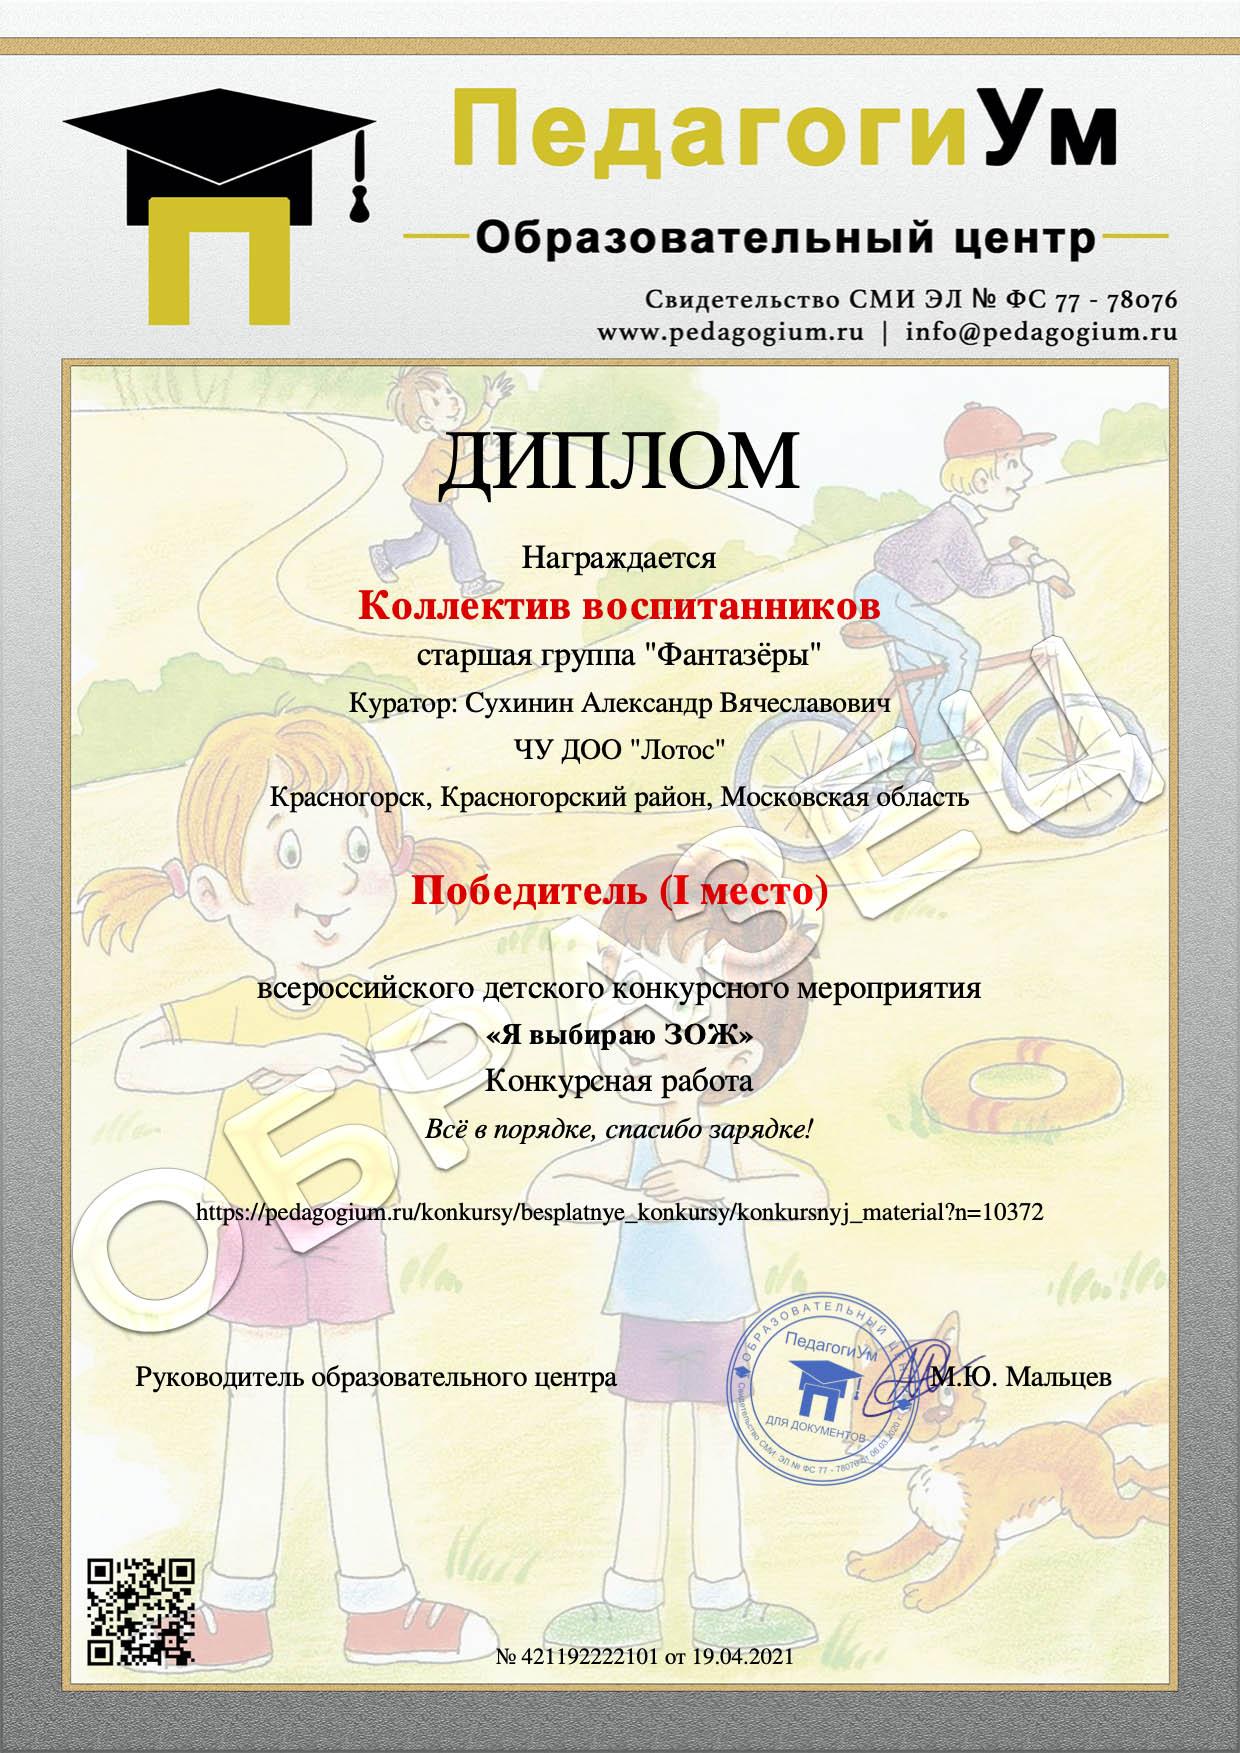 Образец документа воспитаннику-участнику бесплатного детского конкурса центра ПедагогиУм.